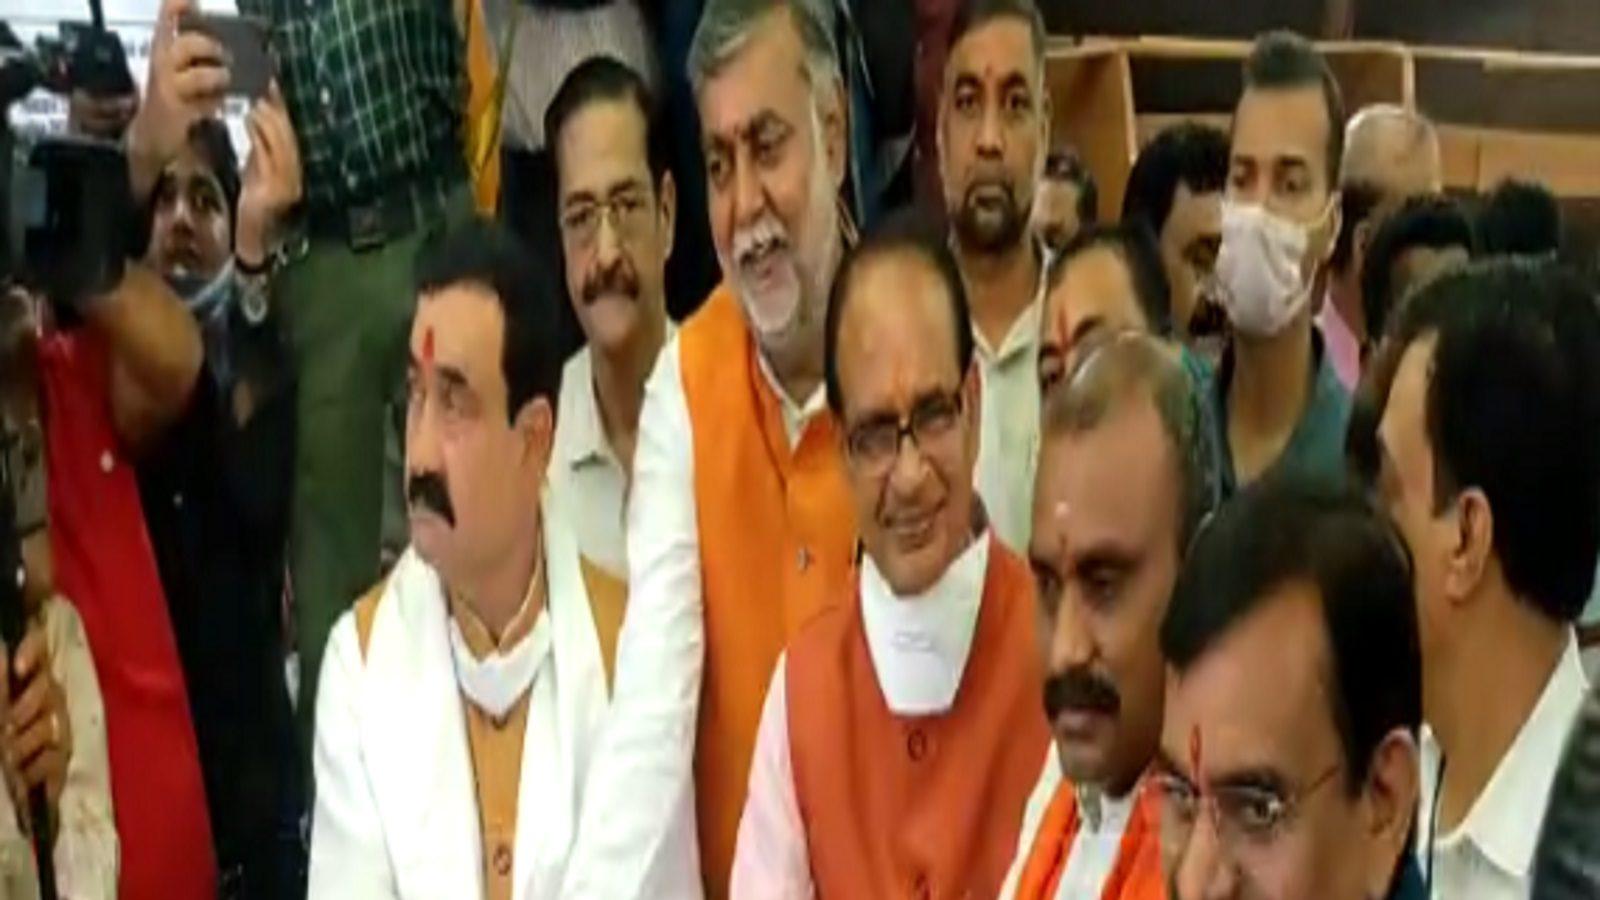 Rajya Sabha Election : केंद्रीय मंत्री एल मुरूगन ने नामांकन पत्र दाखिल किया, निर्विरोध चुना जाना तय